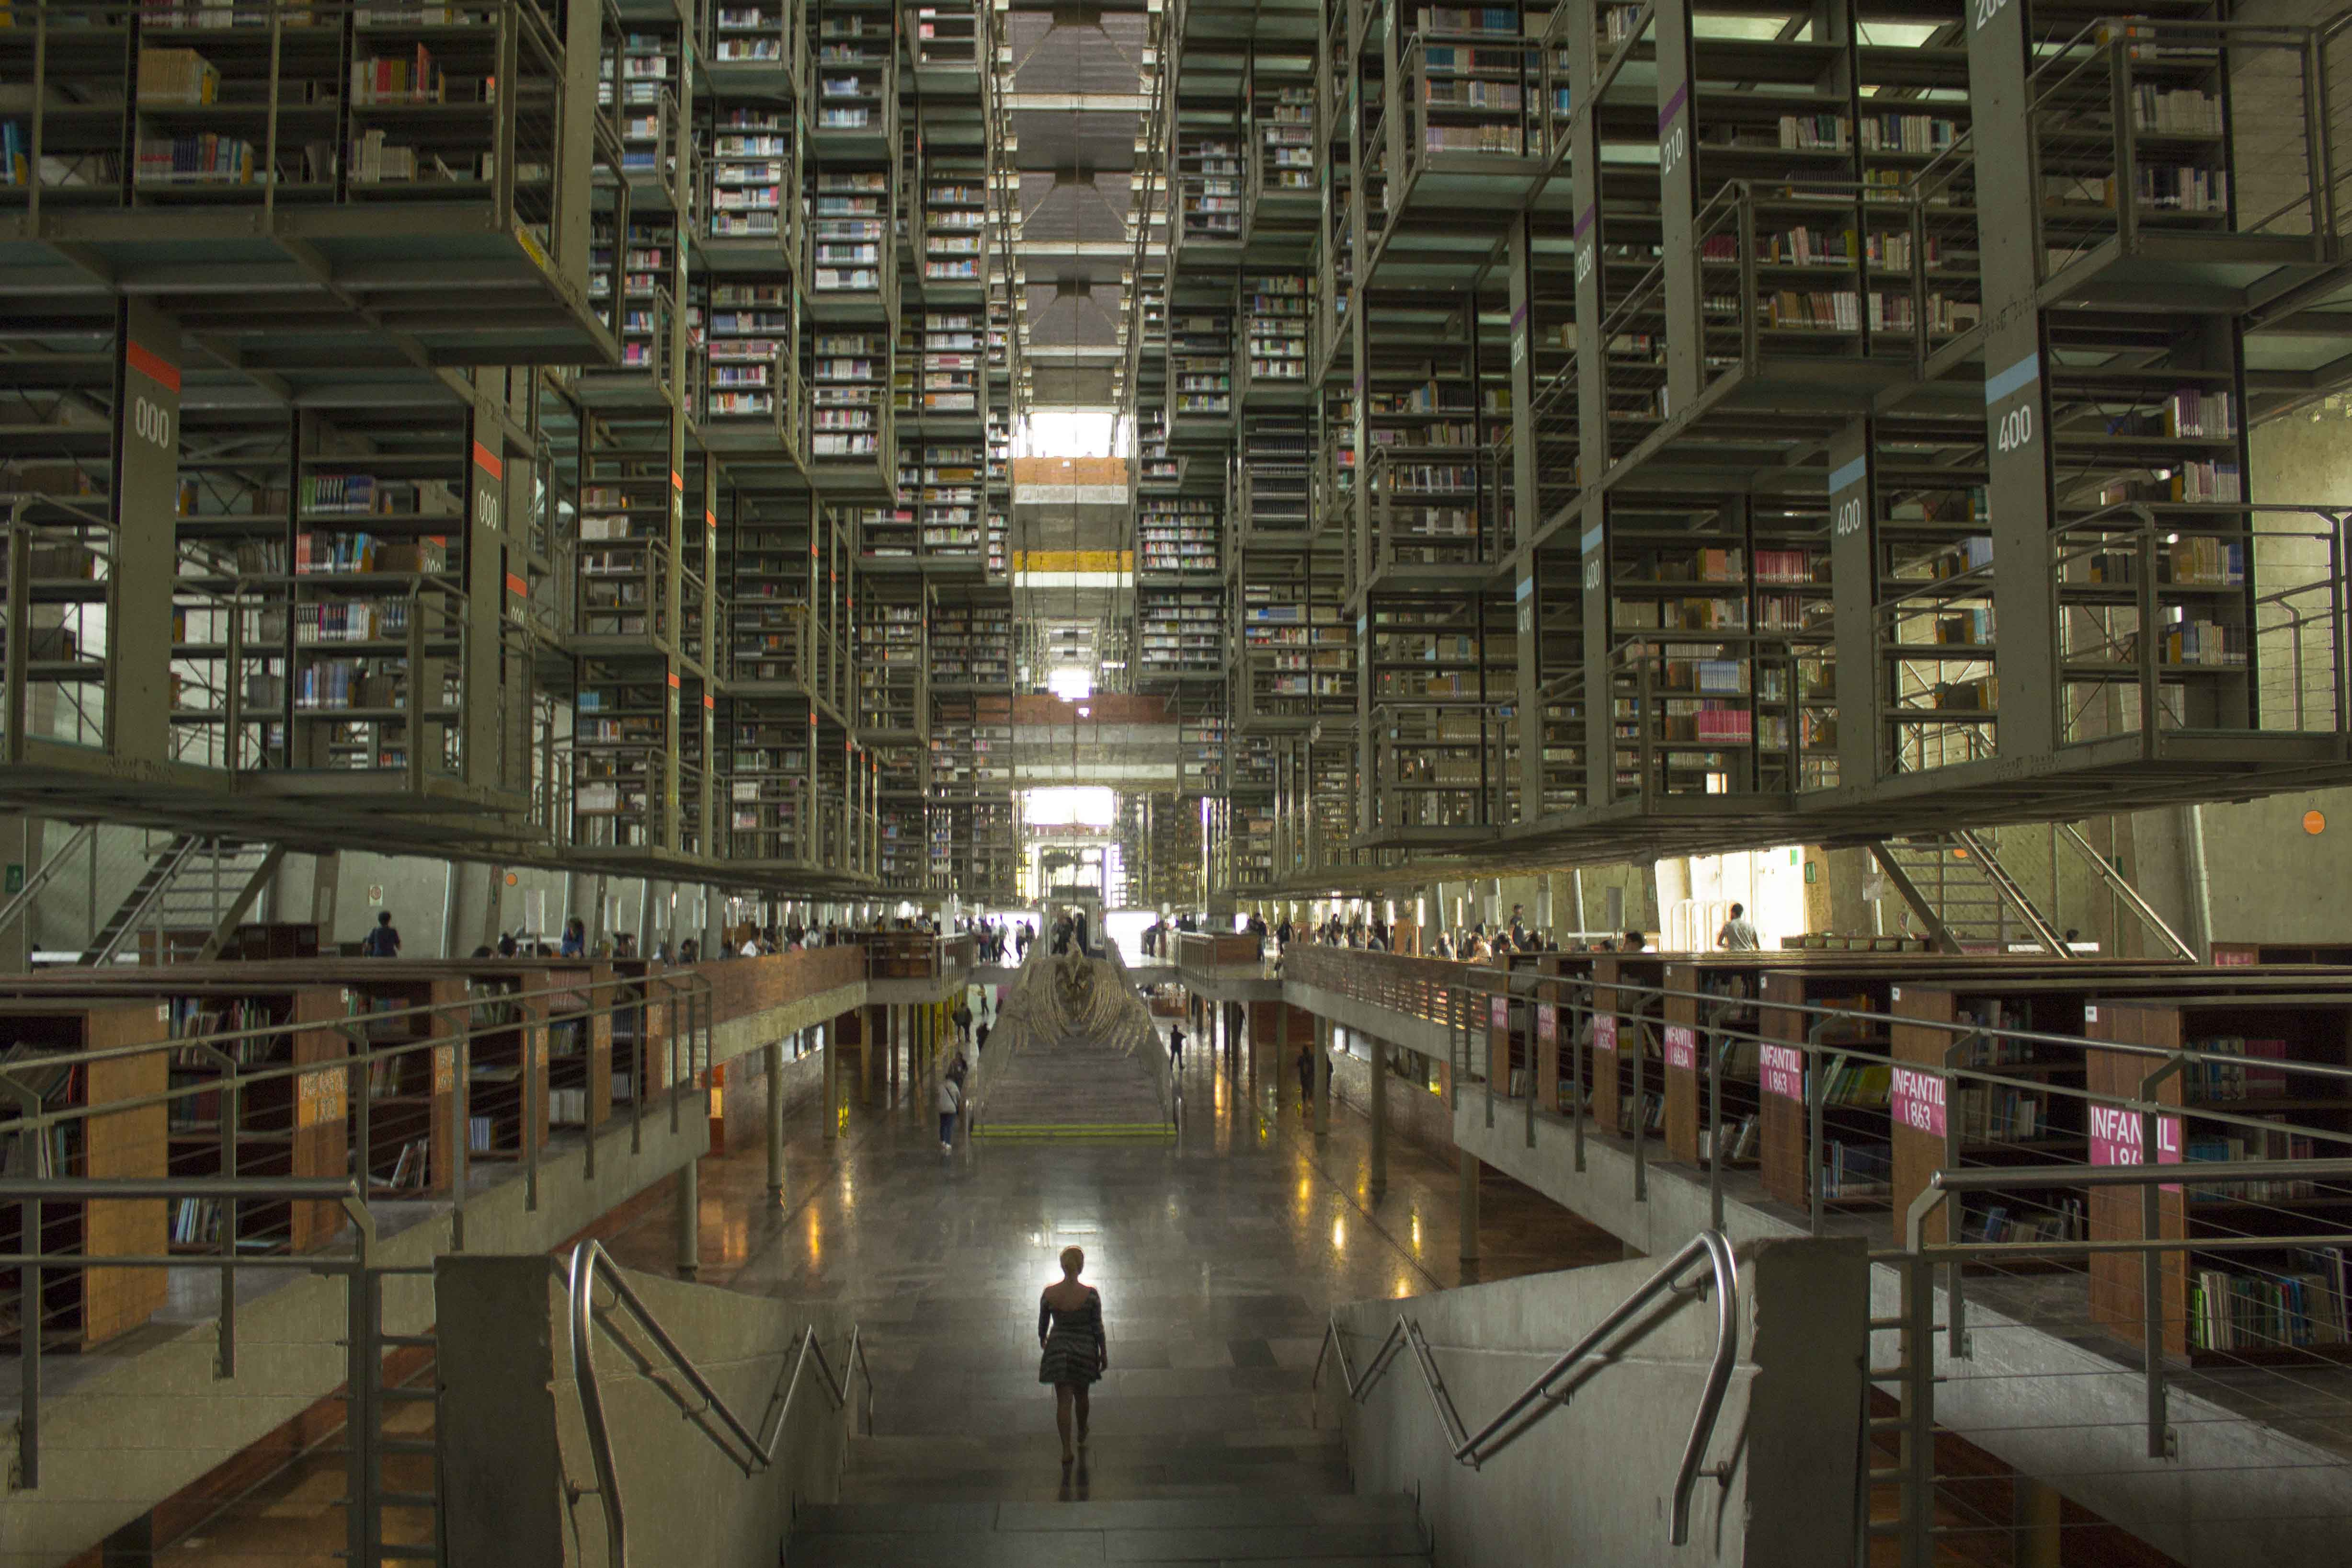 Biblioteca Vasconcelos library in Mexico City